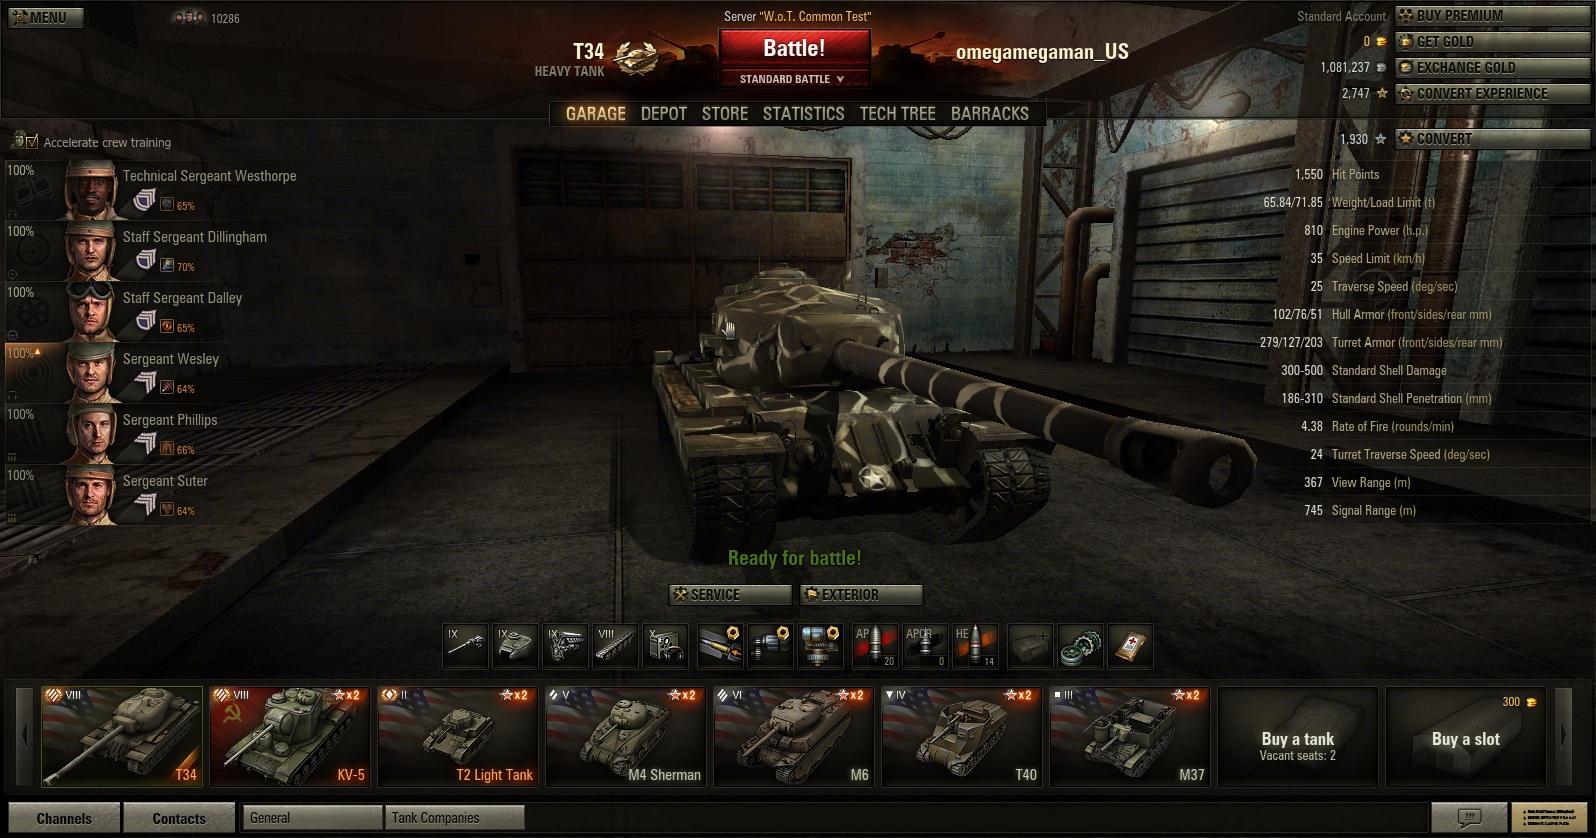 My T-34 American Heavy Tank  by universaldispersal on DeviantArt